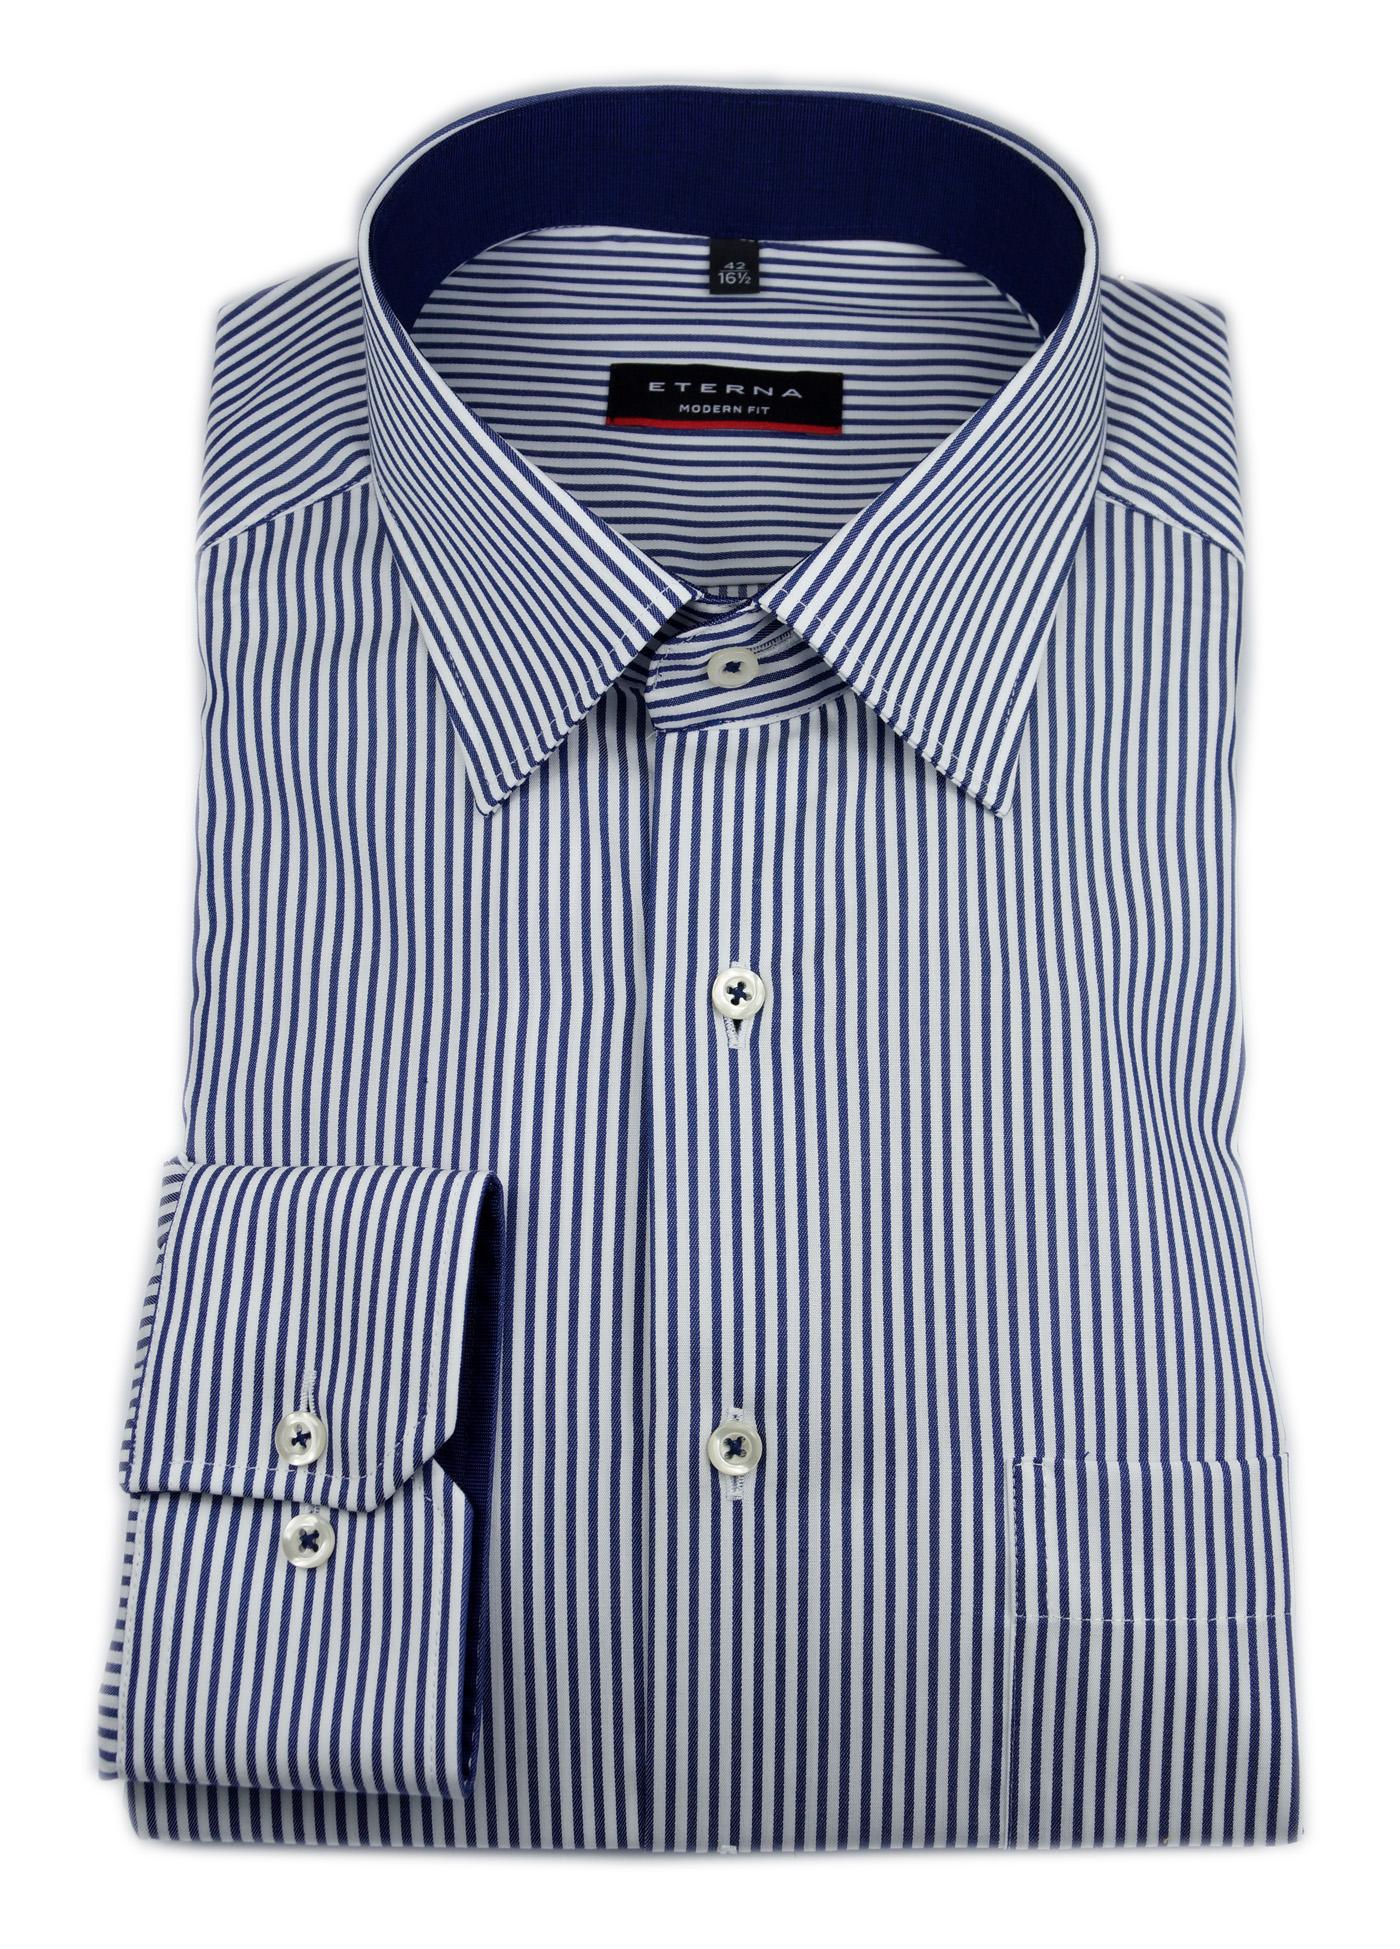 ETERNA-Langarm-Hemd-Modern-Fit-Twill-gestreift-blau-rot-lila-Patch-3151-X15P